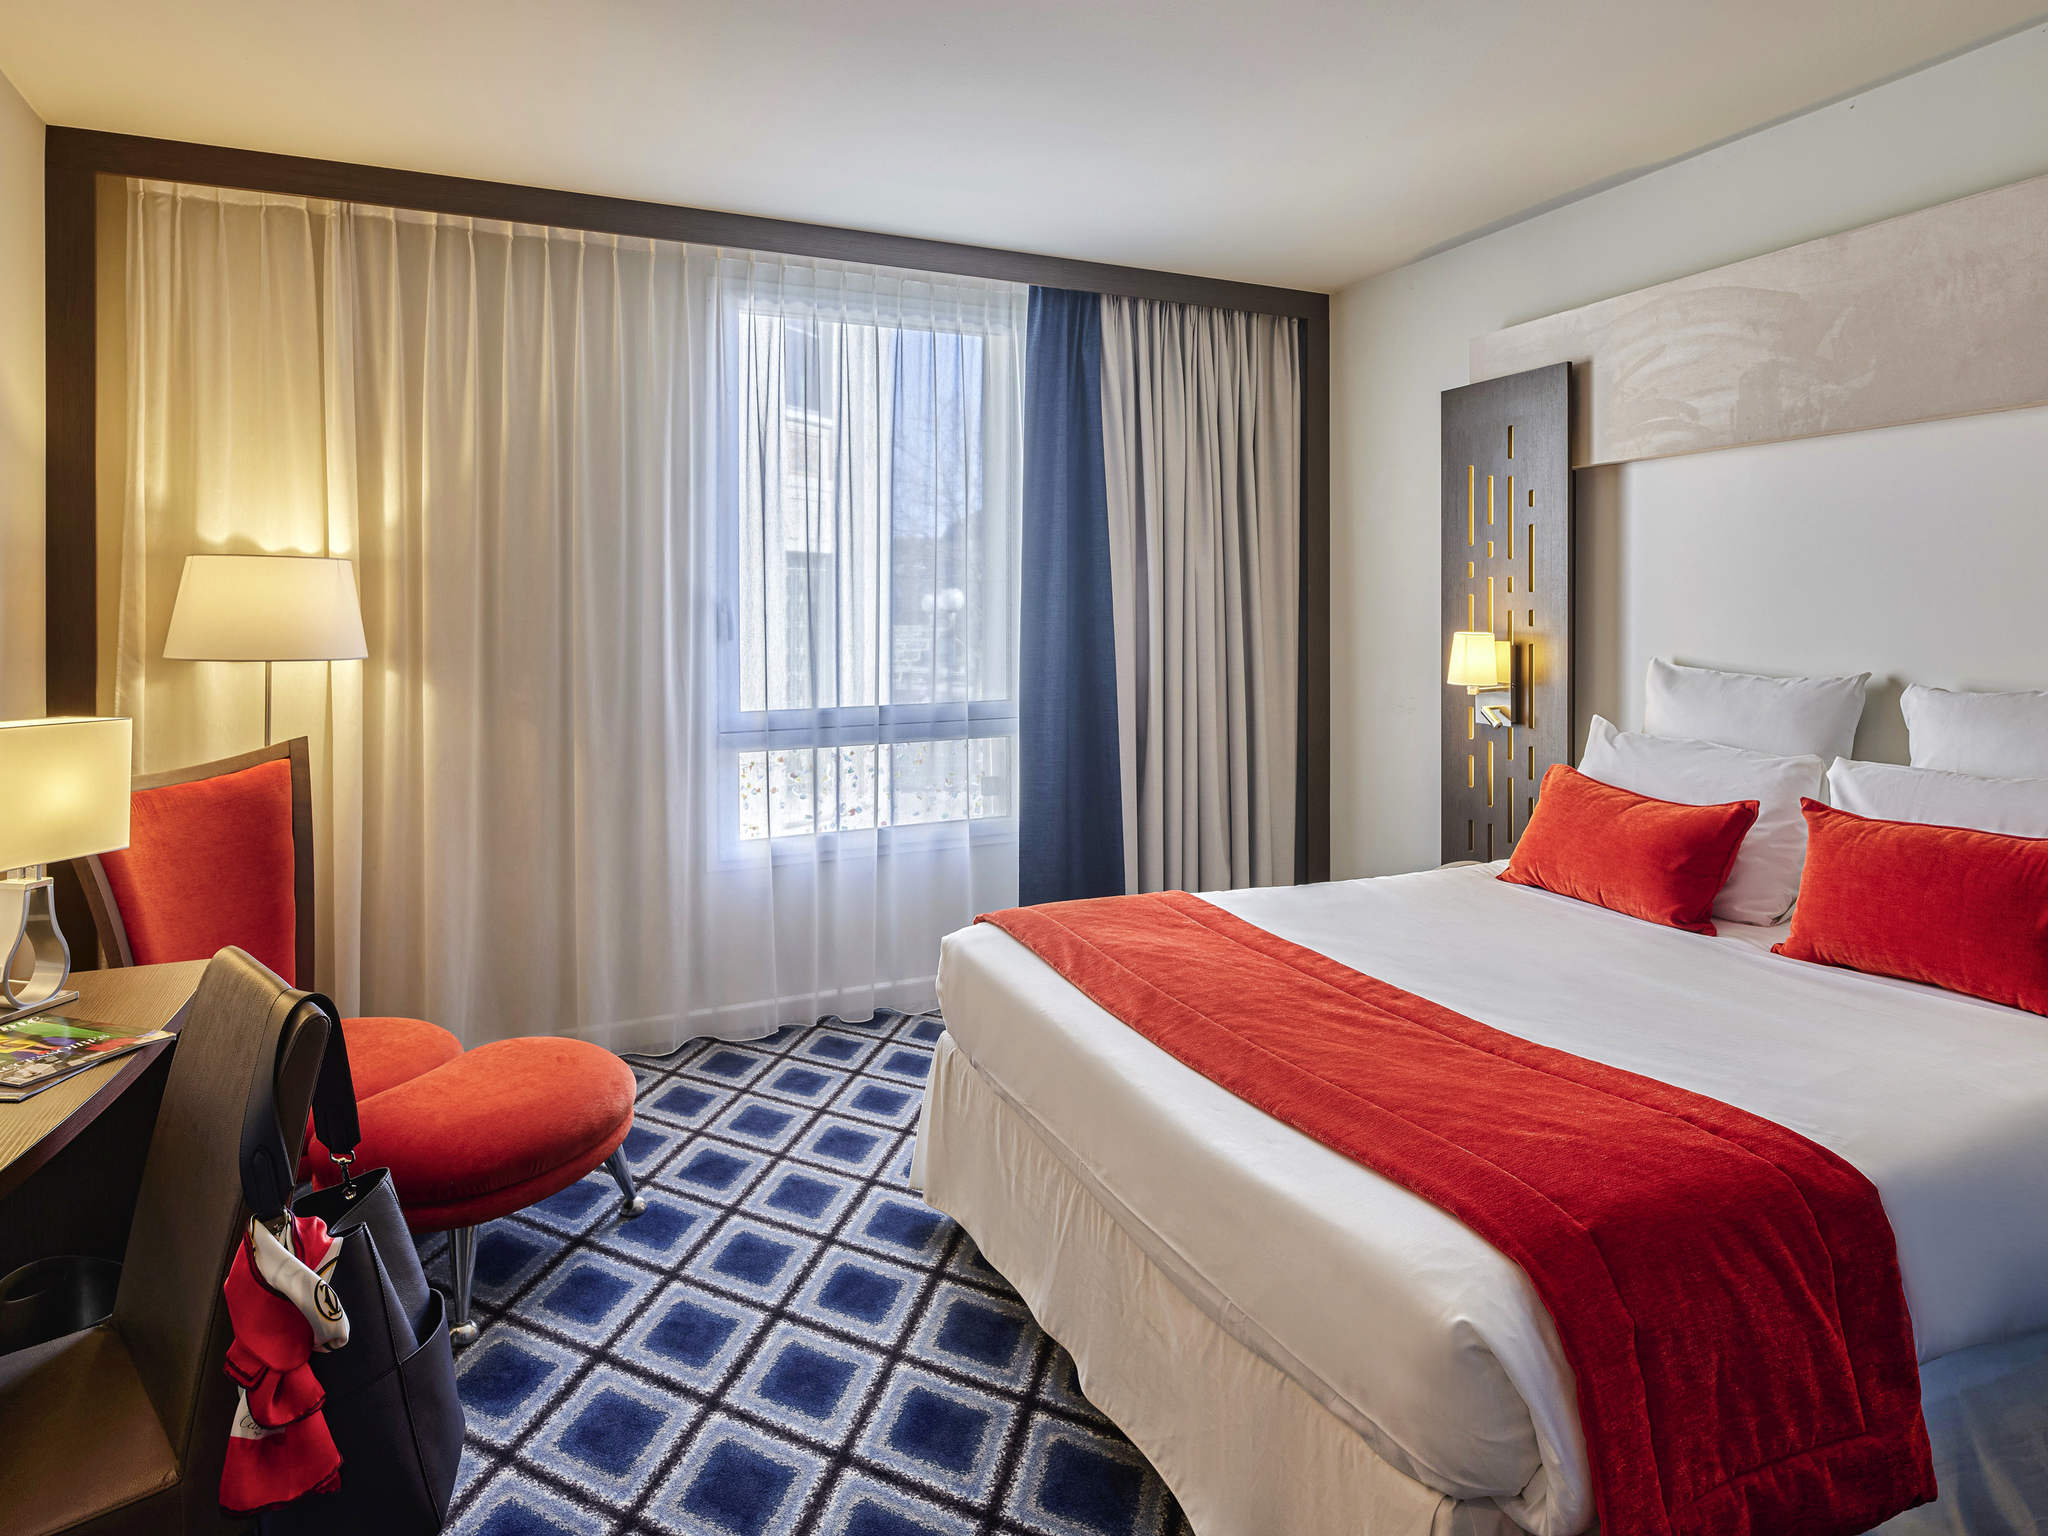 Hotel – Hotel Mercure Chartres Centre Cathédrale